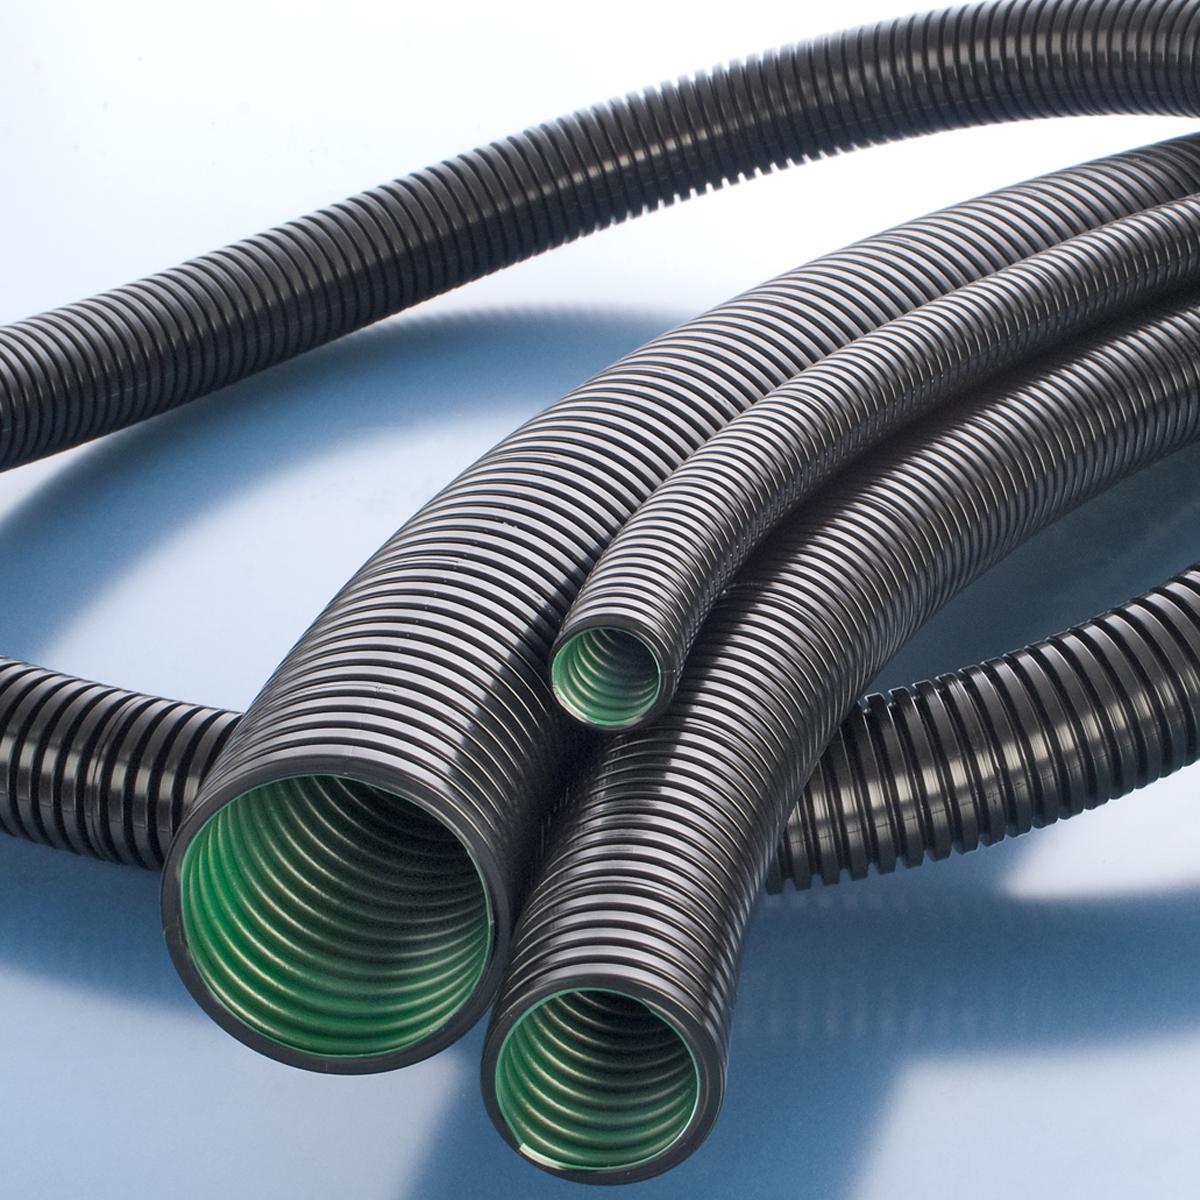 Split Loom Wire Conduit Rigid Tubing Outdoor Cable Protector Sleeving 3 Meter